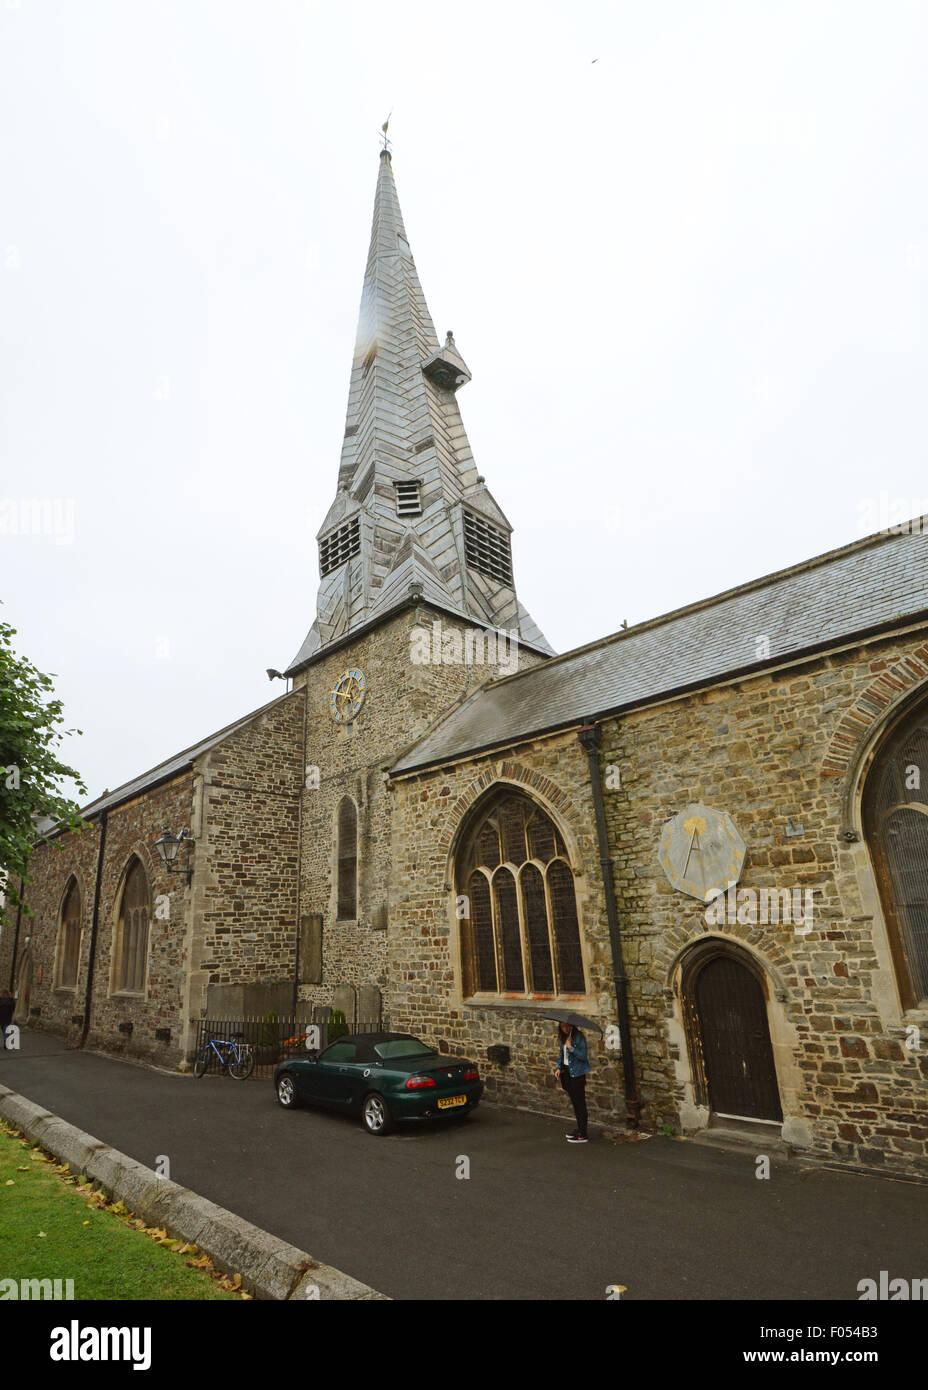 St Peters Church Barnstaple North Devon Parish Church St Peter and St Mary Magdelene - Stock Image